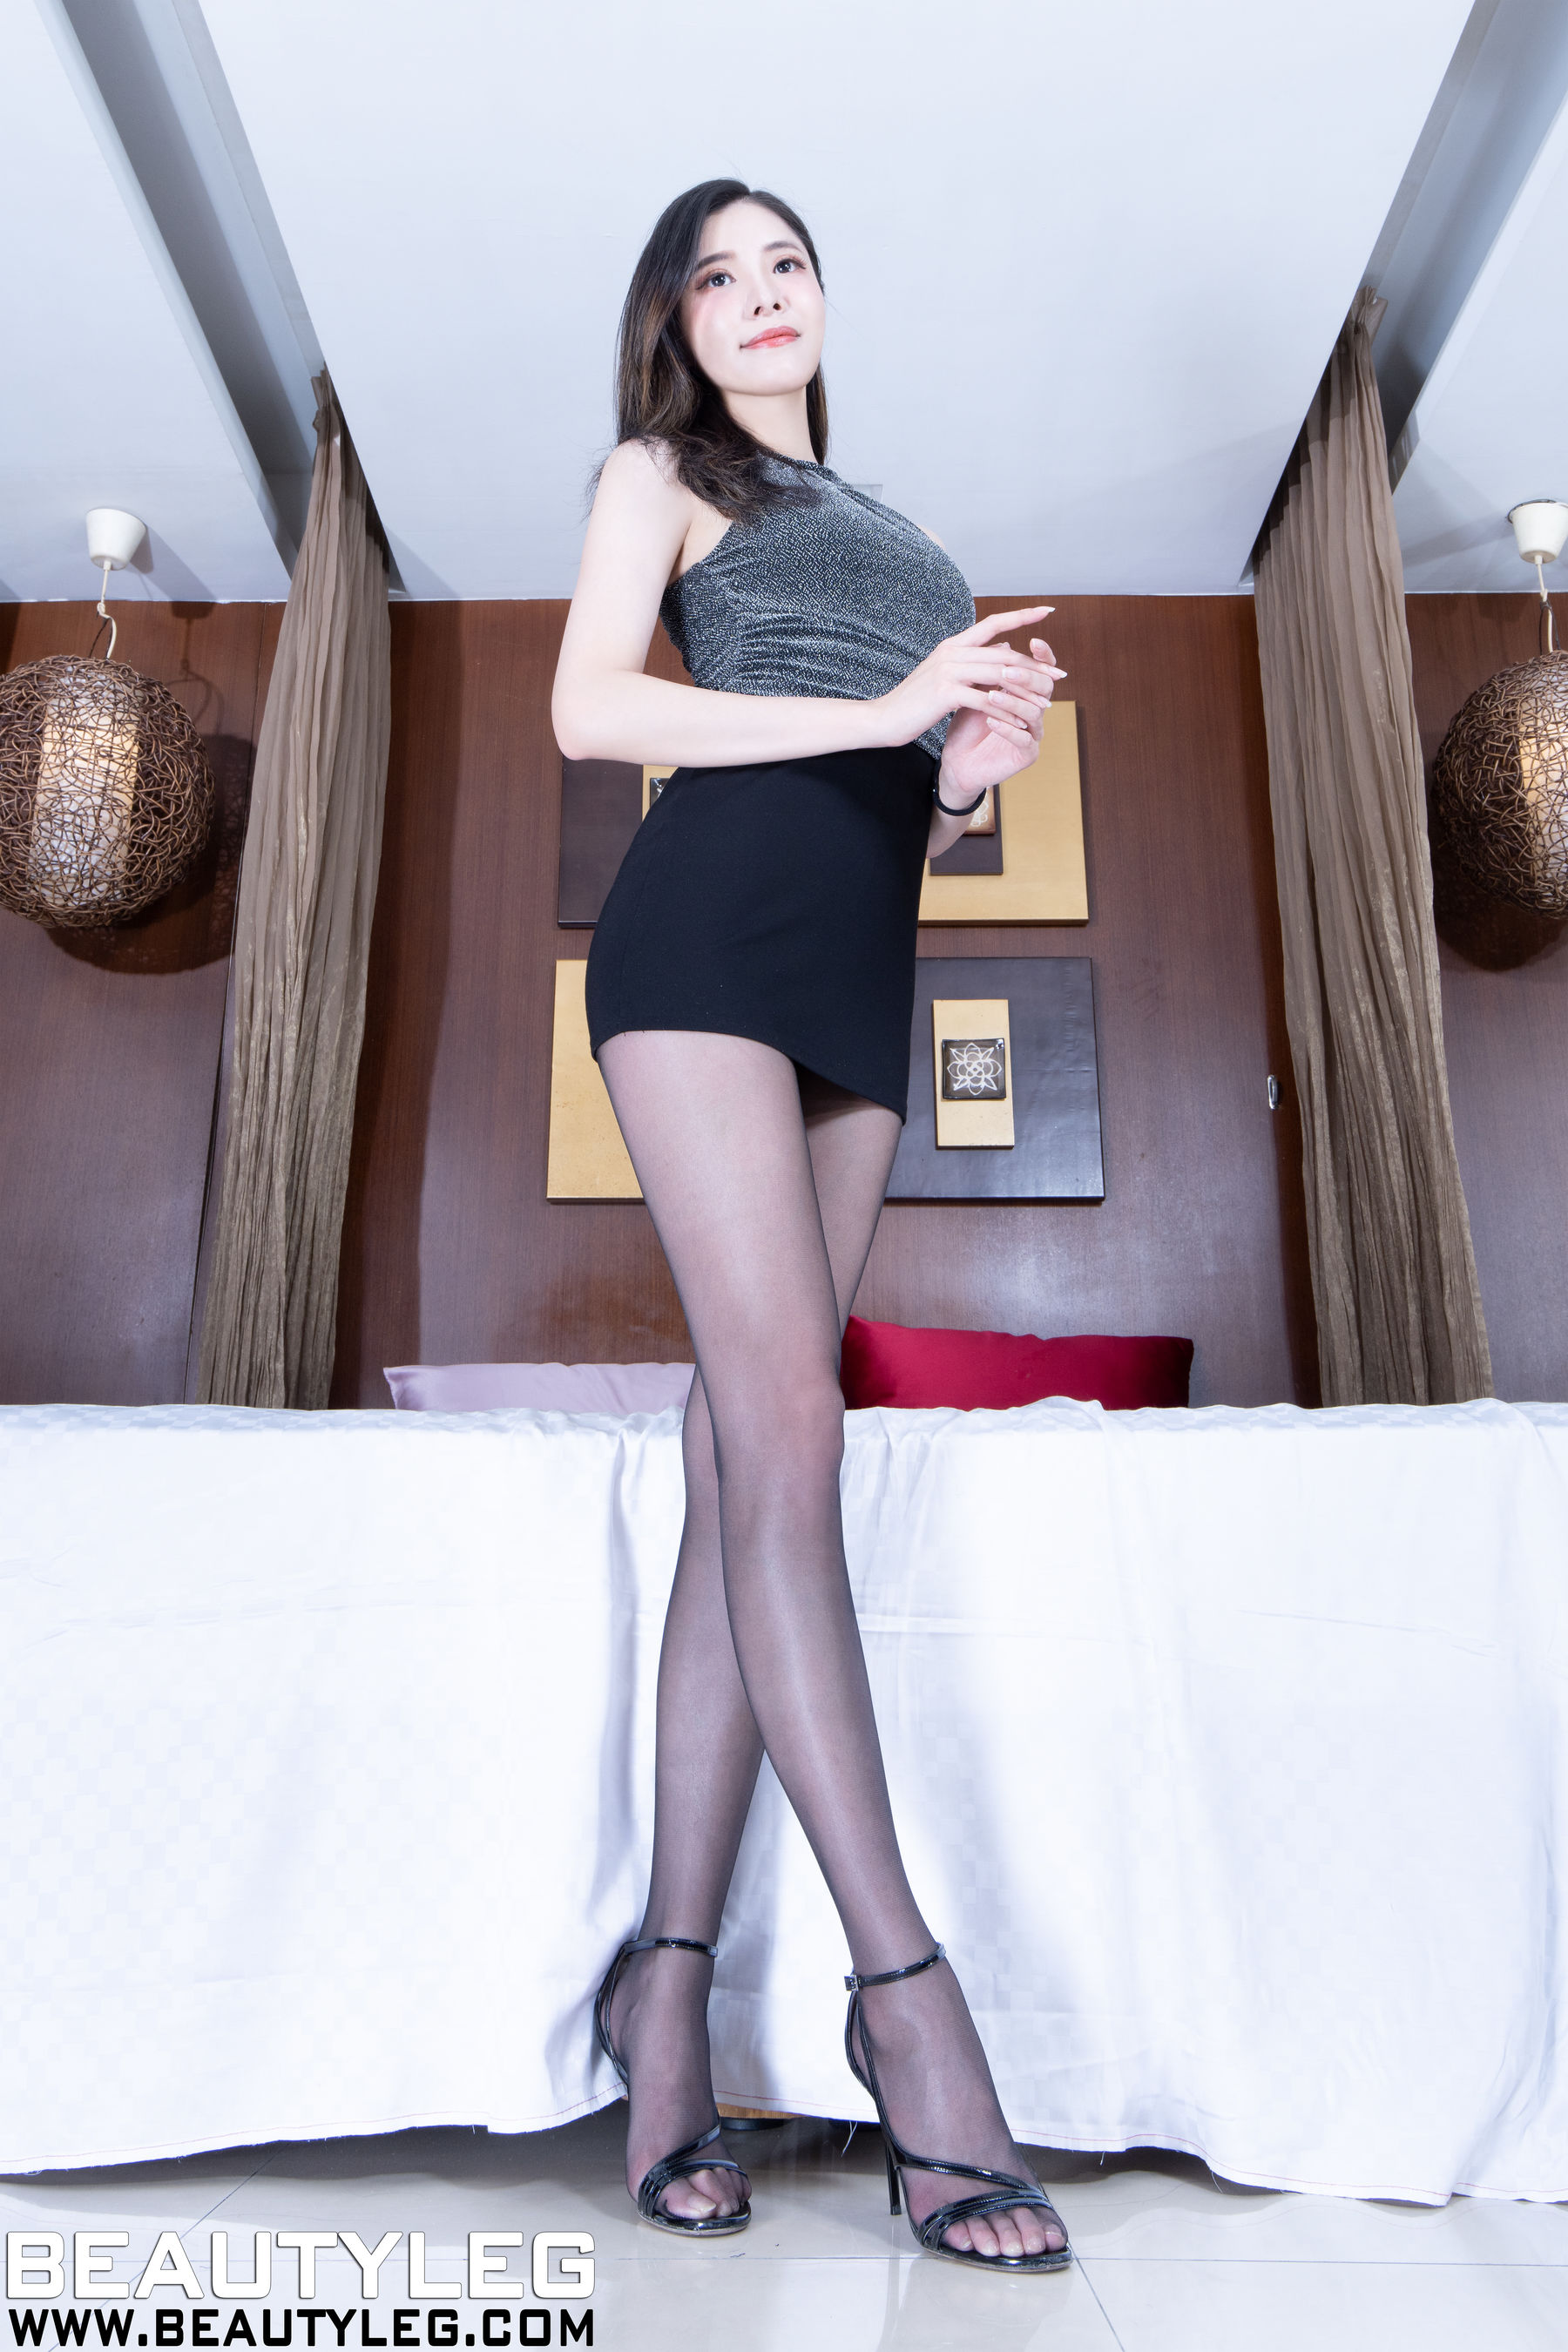 VOL.995 [Beautyleg]包臀裙美女高跟美腿:陈玉雪(腿模Abby)超高清个人性感漂亮大图(48P)